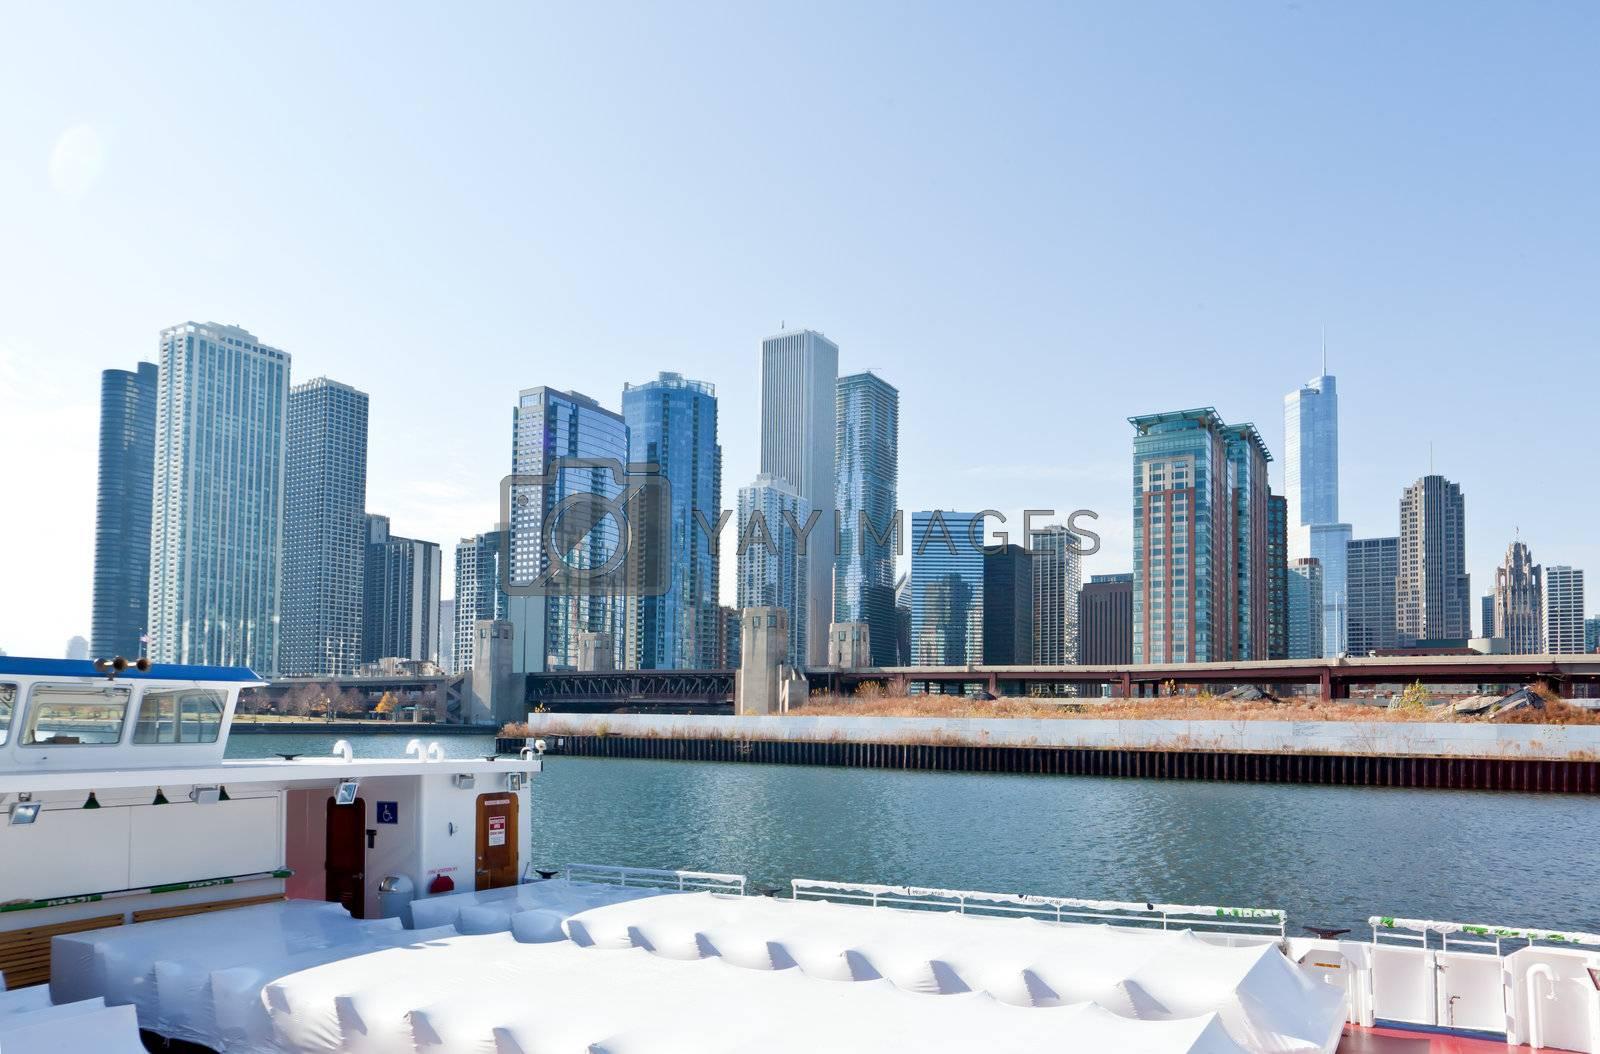 The Chicago Skyline along the lake shore